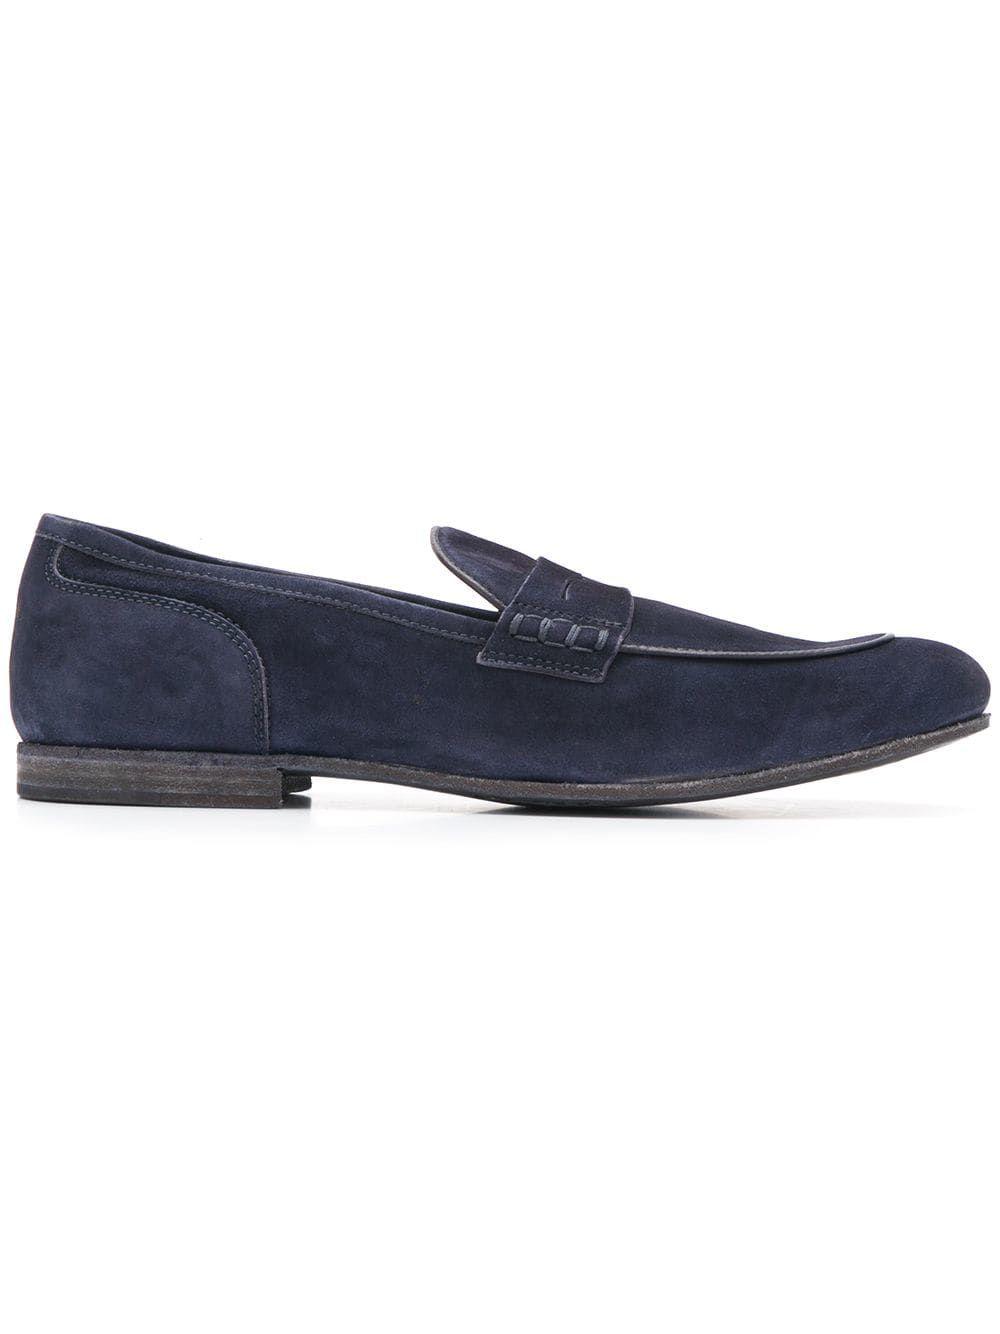 55c2b2bd3a408b OFFICINE CREATIVE OFFICINE CREATIVE BILT LOAFERS - BLUE. #officinecreative # shoes